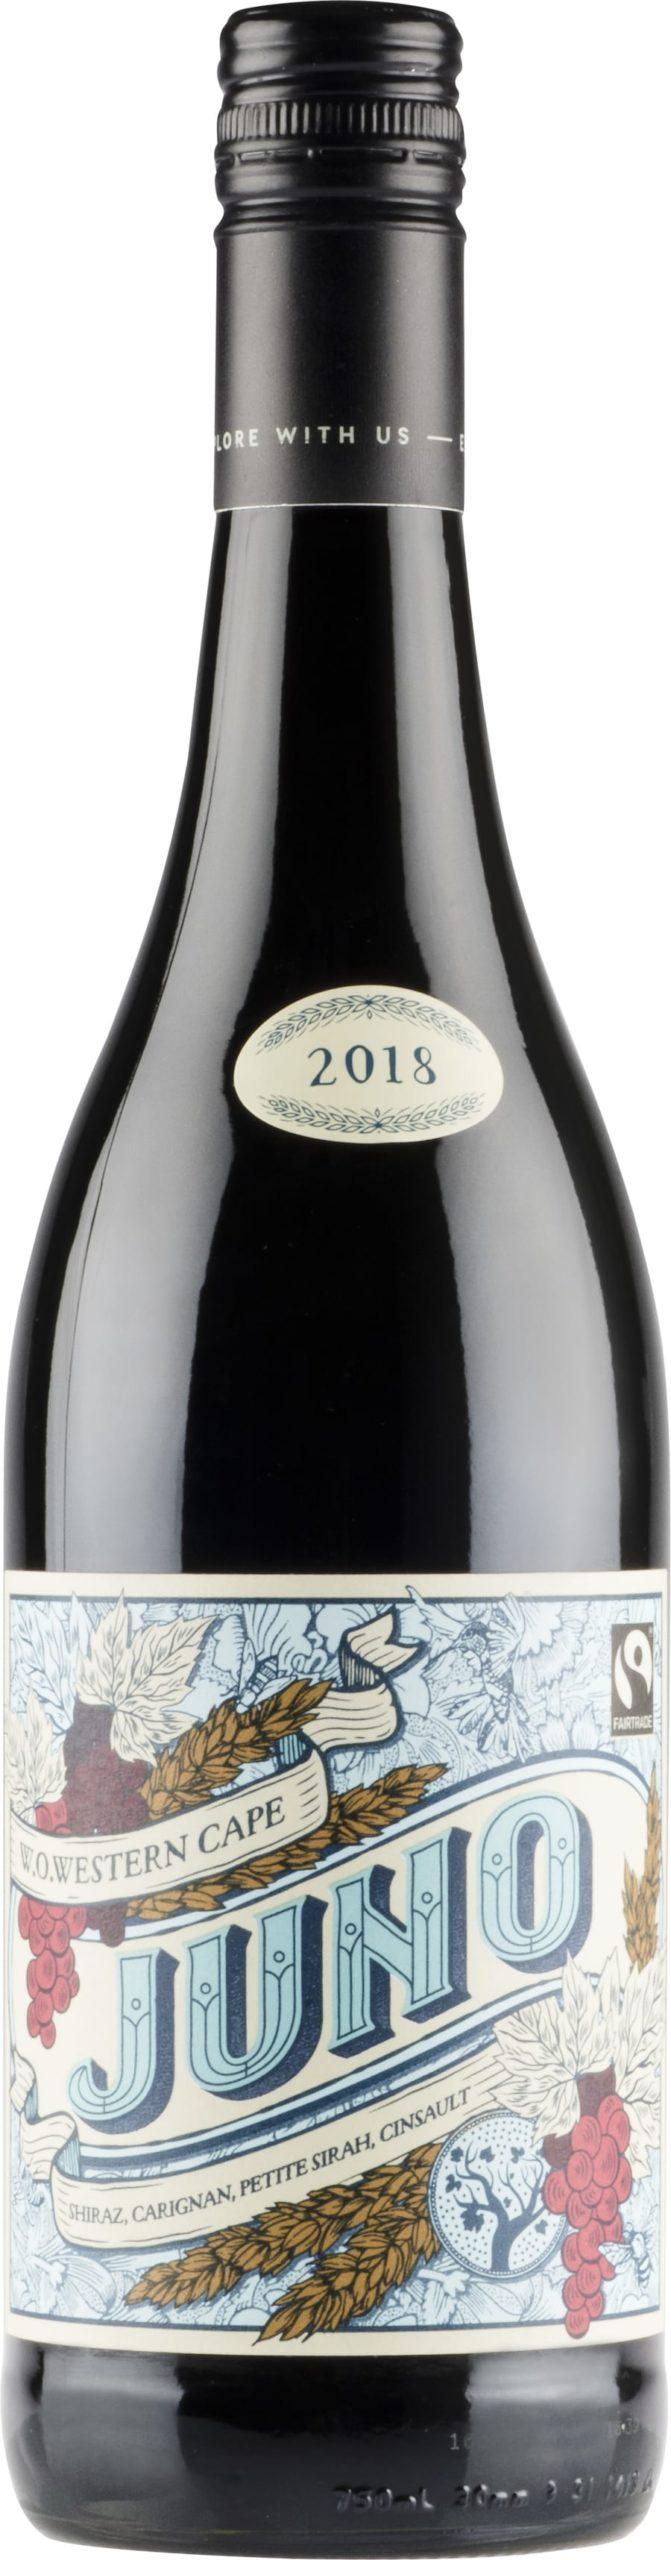 Reilun kaupan viini, Reilu kauppa, Juno viini, Reset the biz, Fairtrade wine, wine, punaviini, Alko,